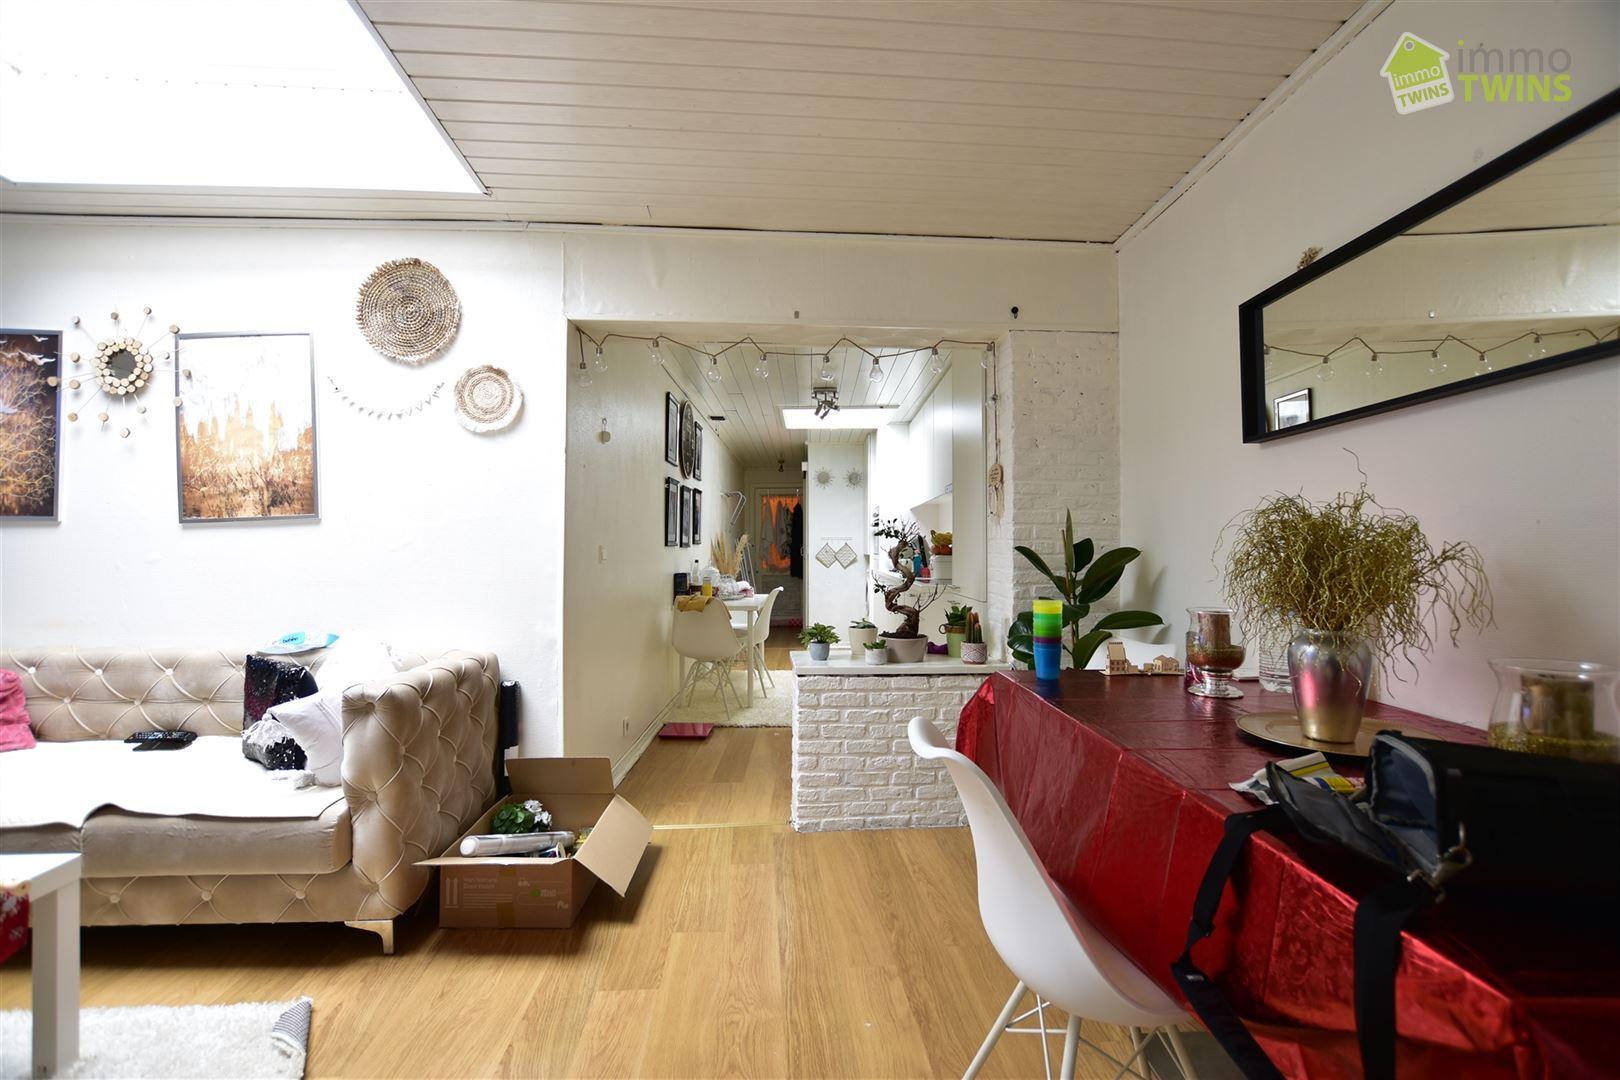 Foto 6 : Woning te 9200 Sint-Gillis-bij-Dendermonde (België) - Prijs € 585